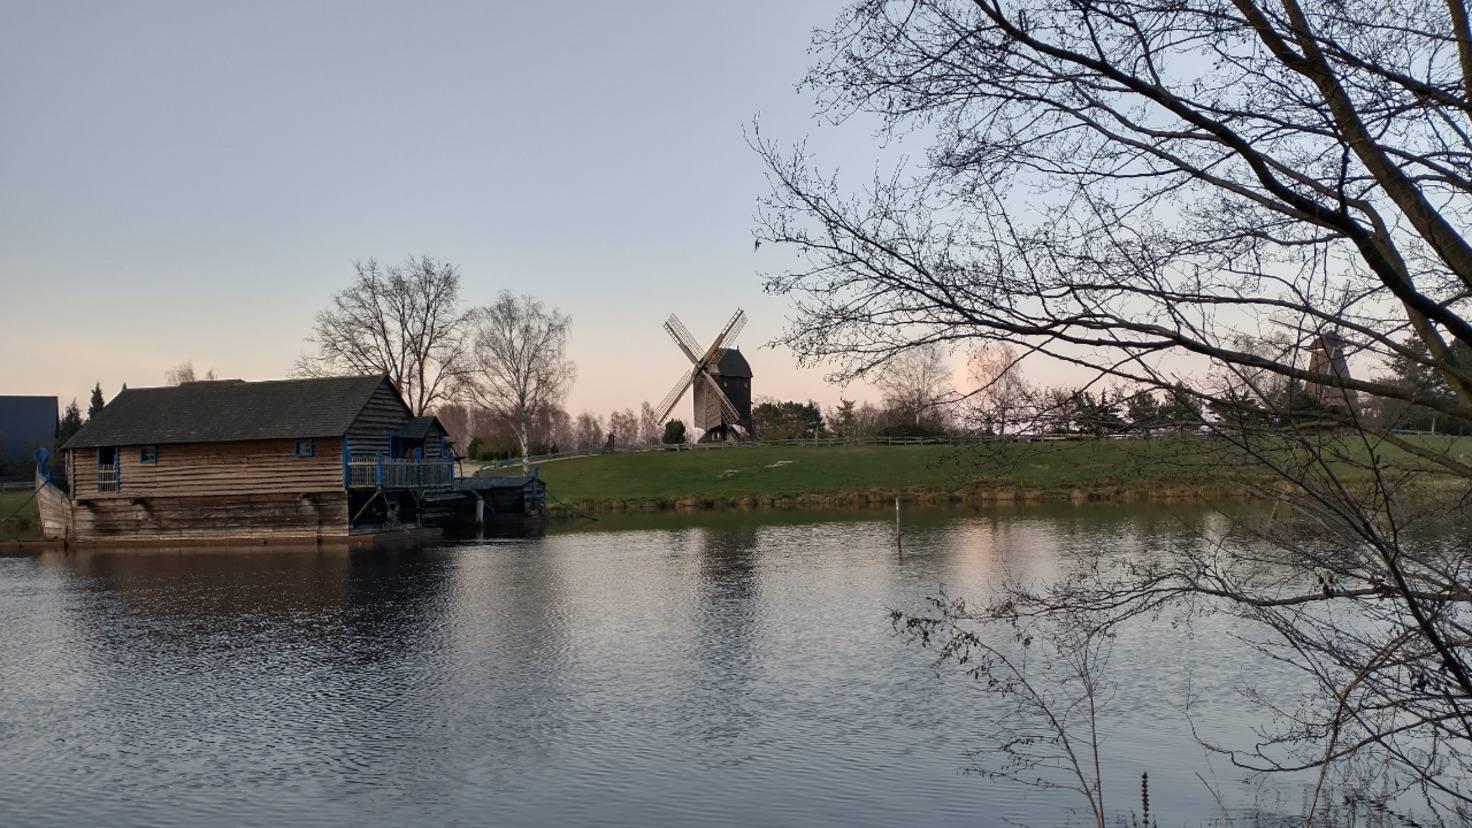 Die Mühle im Ultraweitwinkelformat.